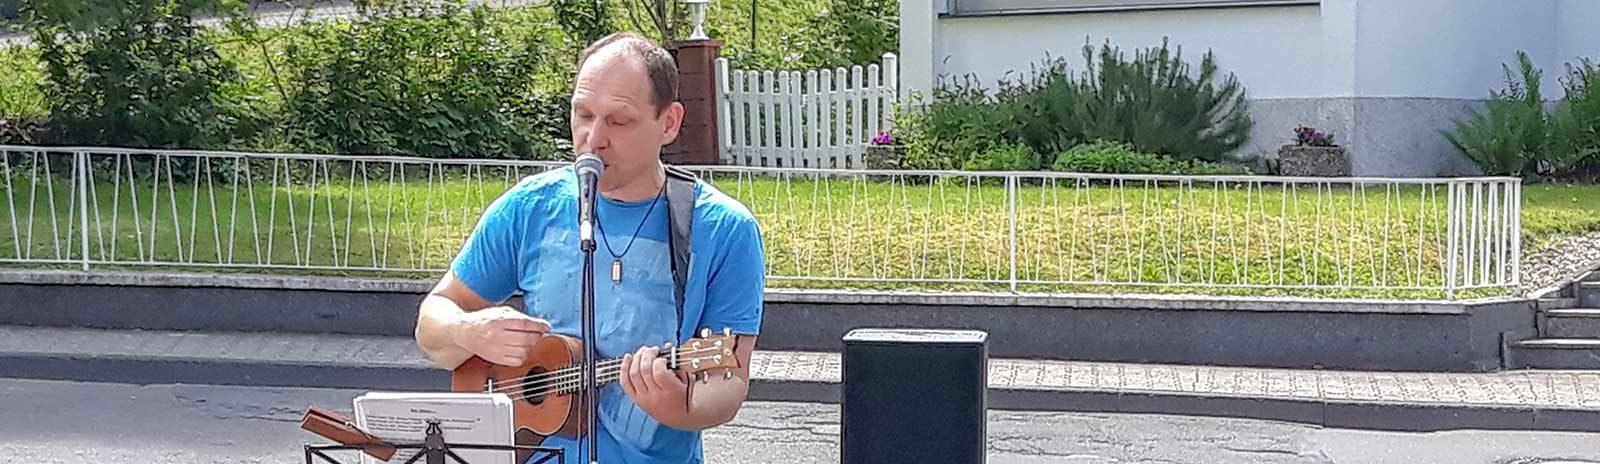 2020_05_27_Haus_Nahetal_Musik_slider